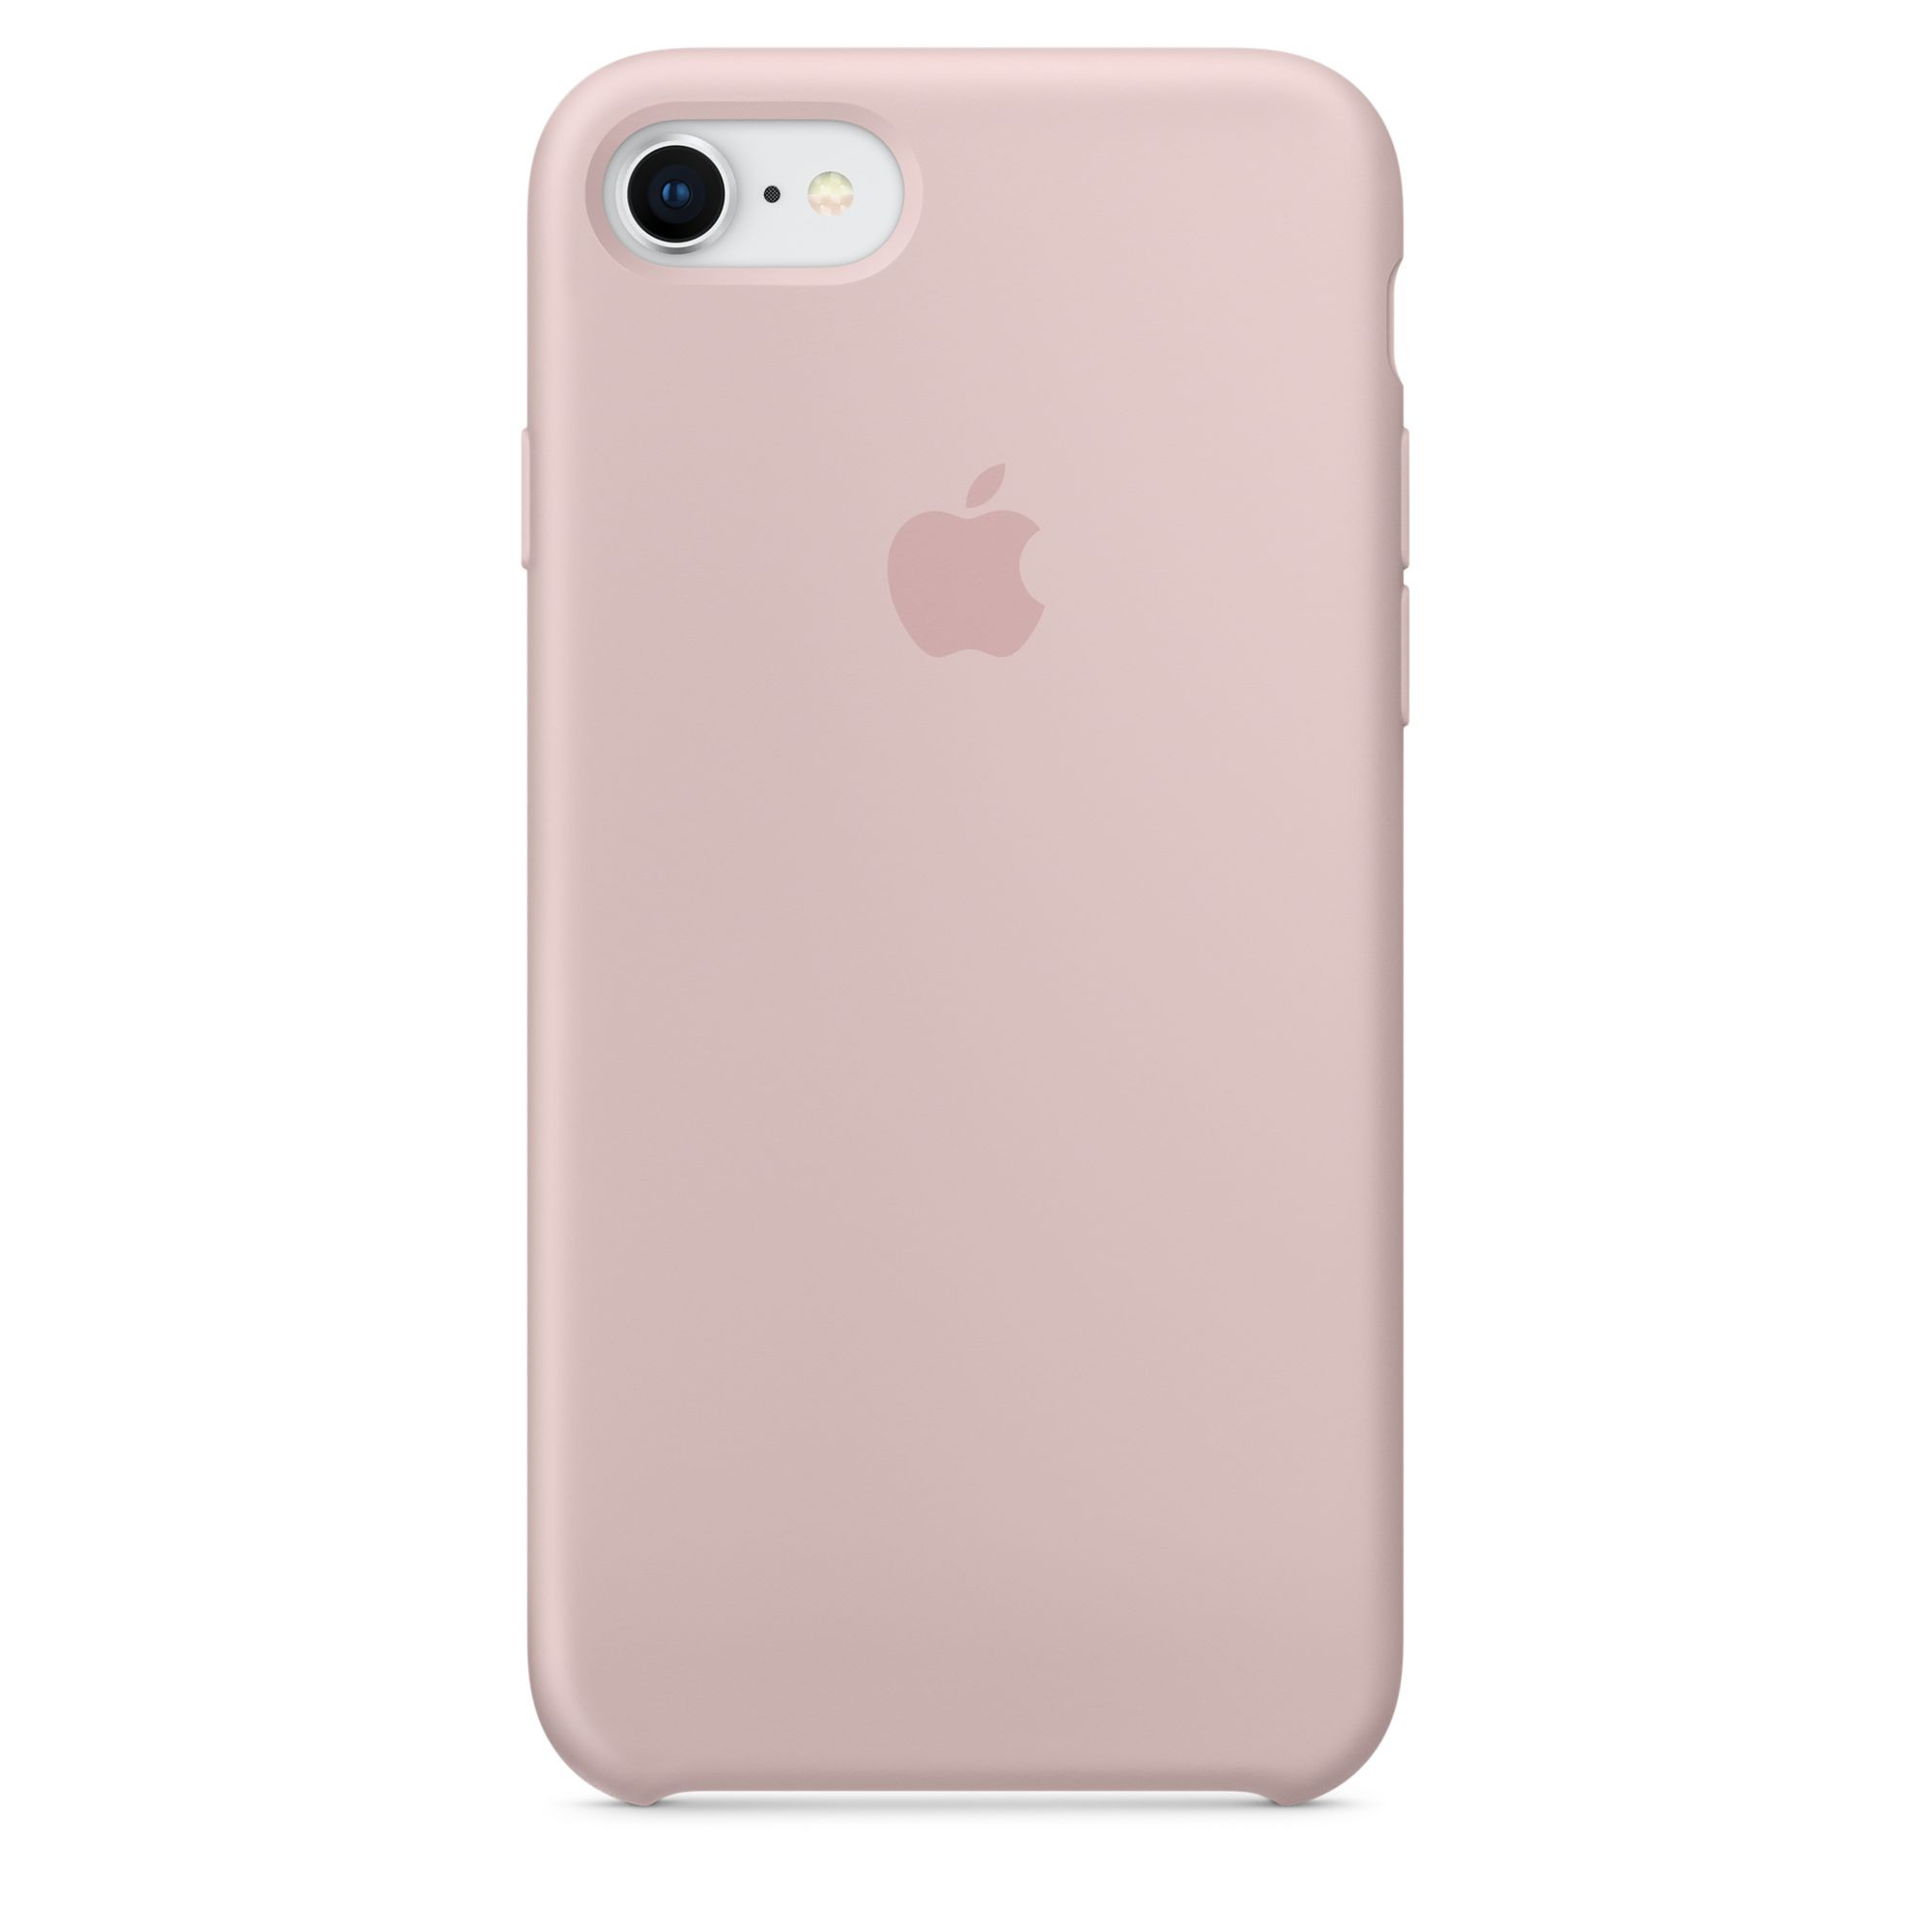 Apple silikonový kryt na iPhone 8 / 7 – pískově růžový